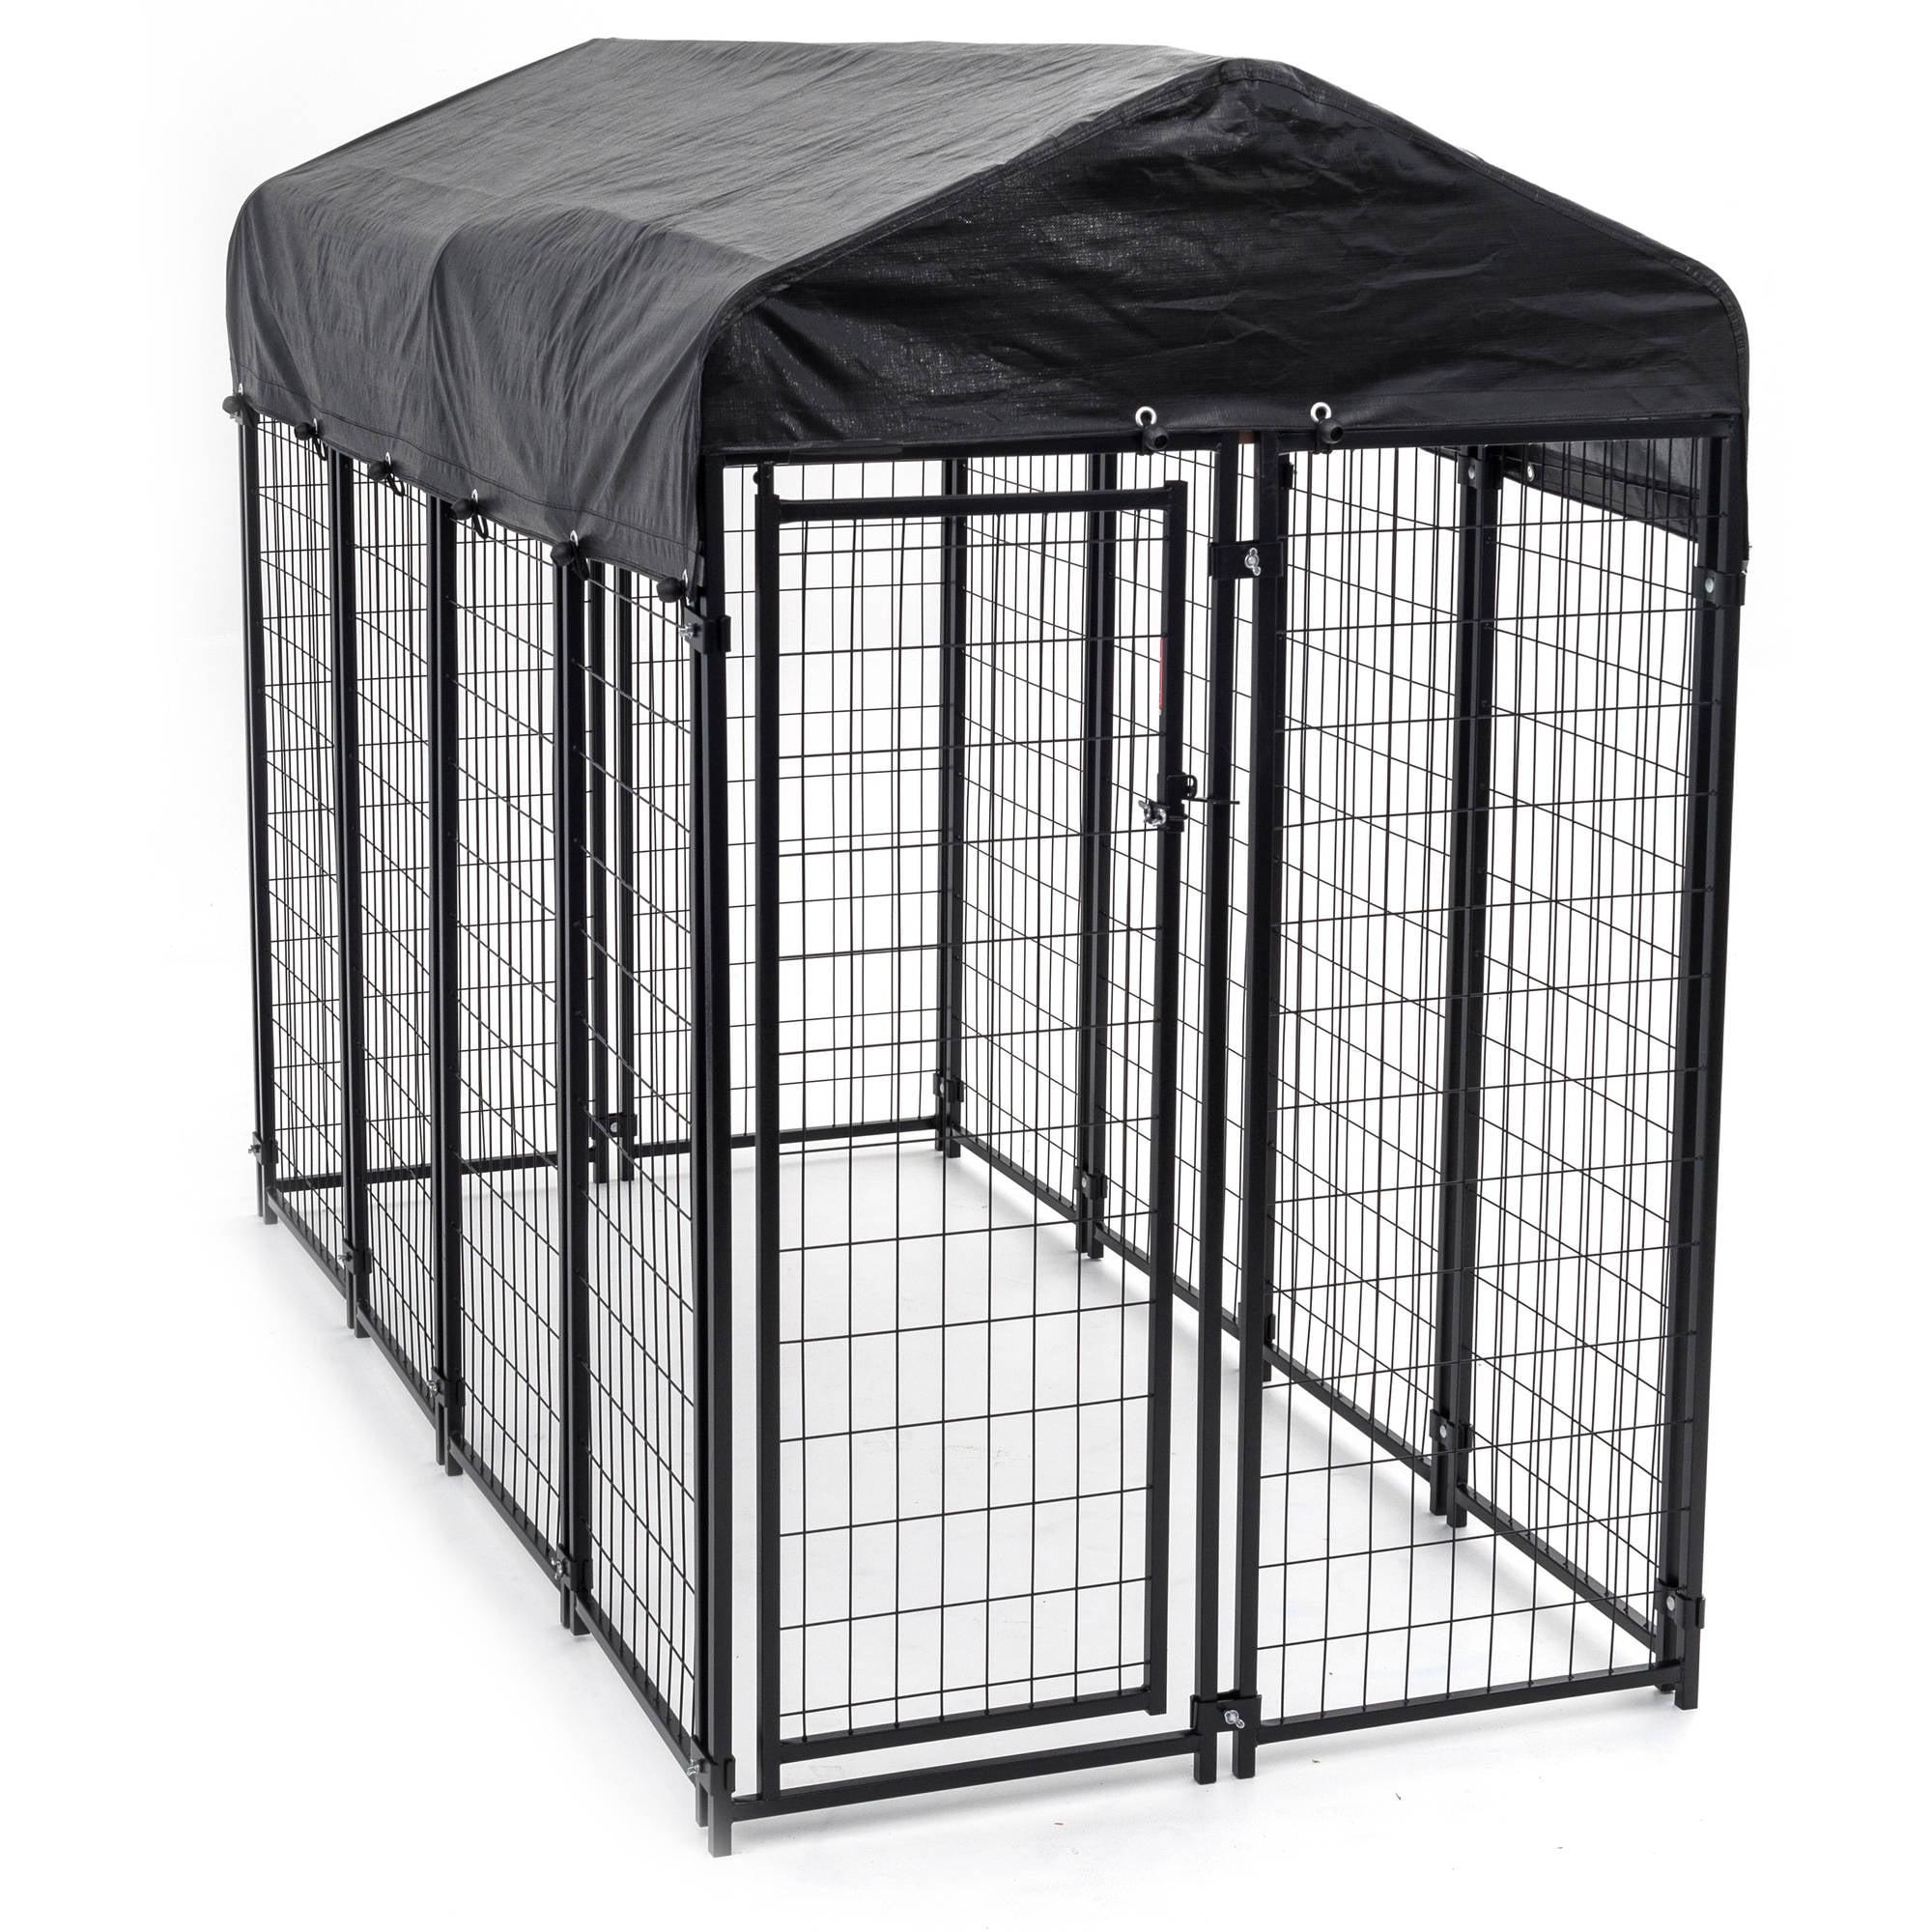 Lucky Dog Welded Wire Uptown Dog Kennel, 6\'x 4\' x4\' - Walmart.com